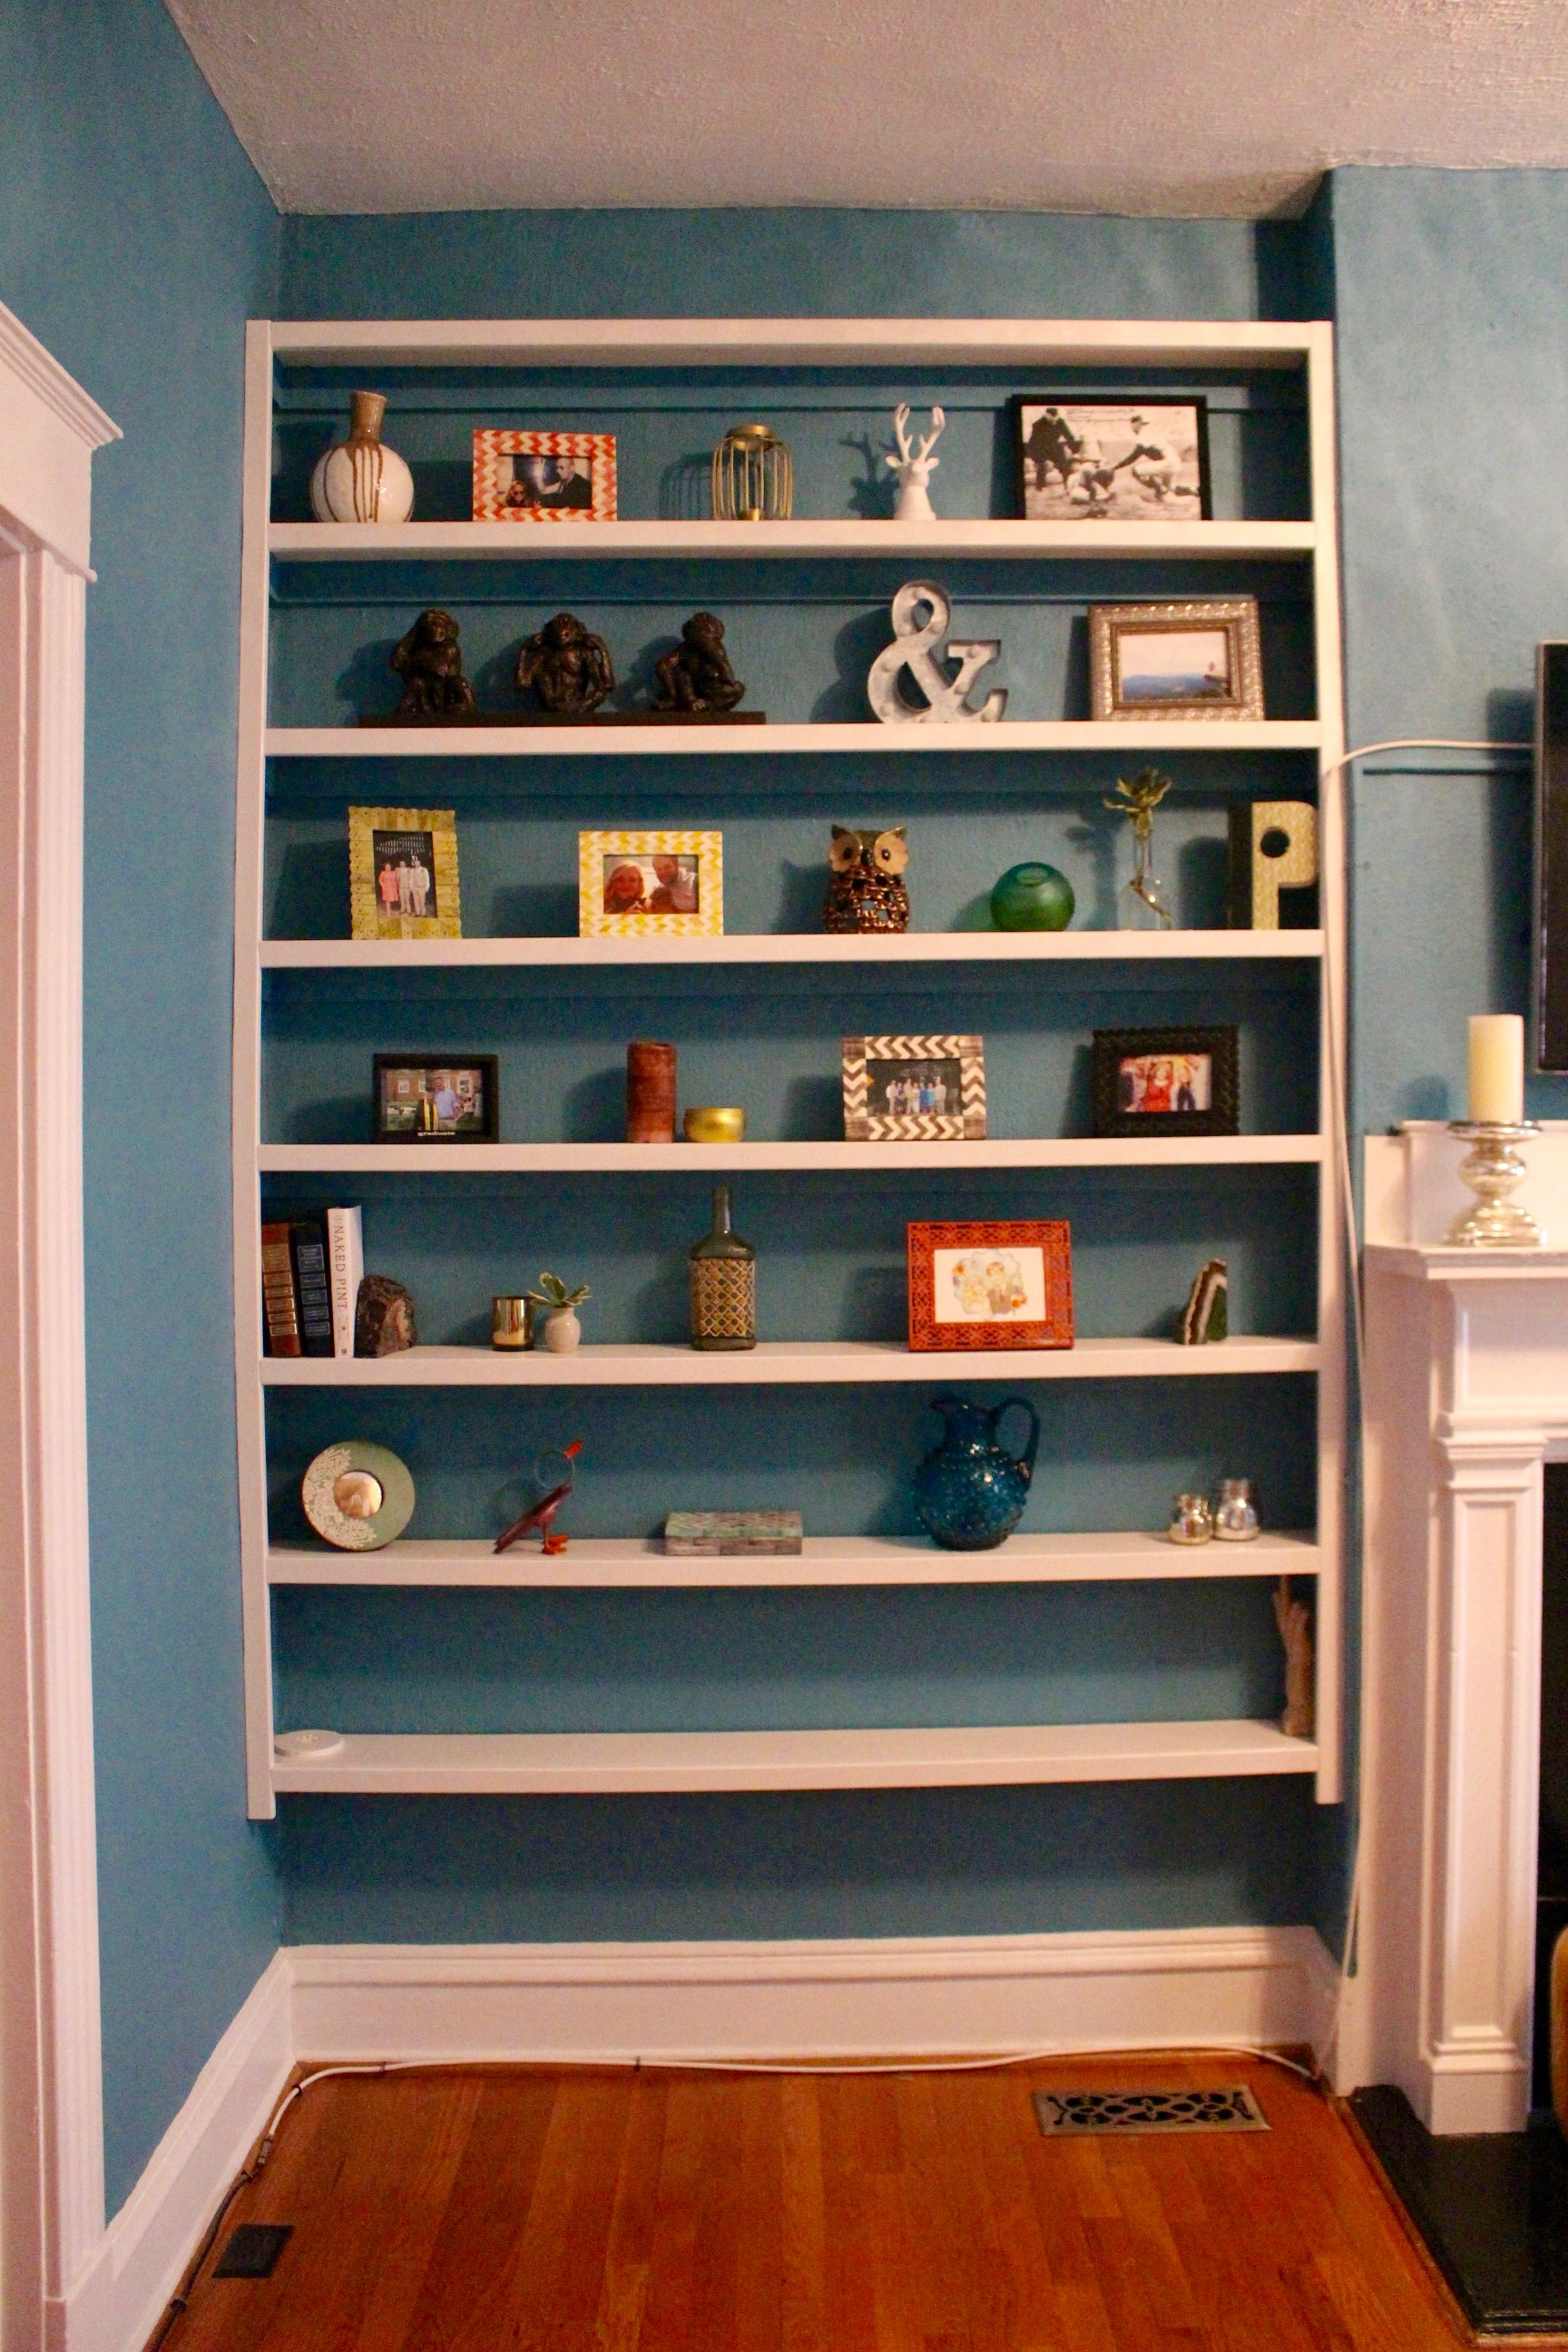 Freebird Imagery plywood repainted for bookshelf